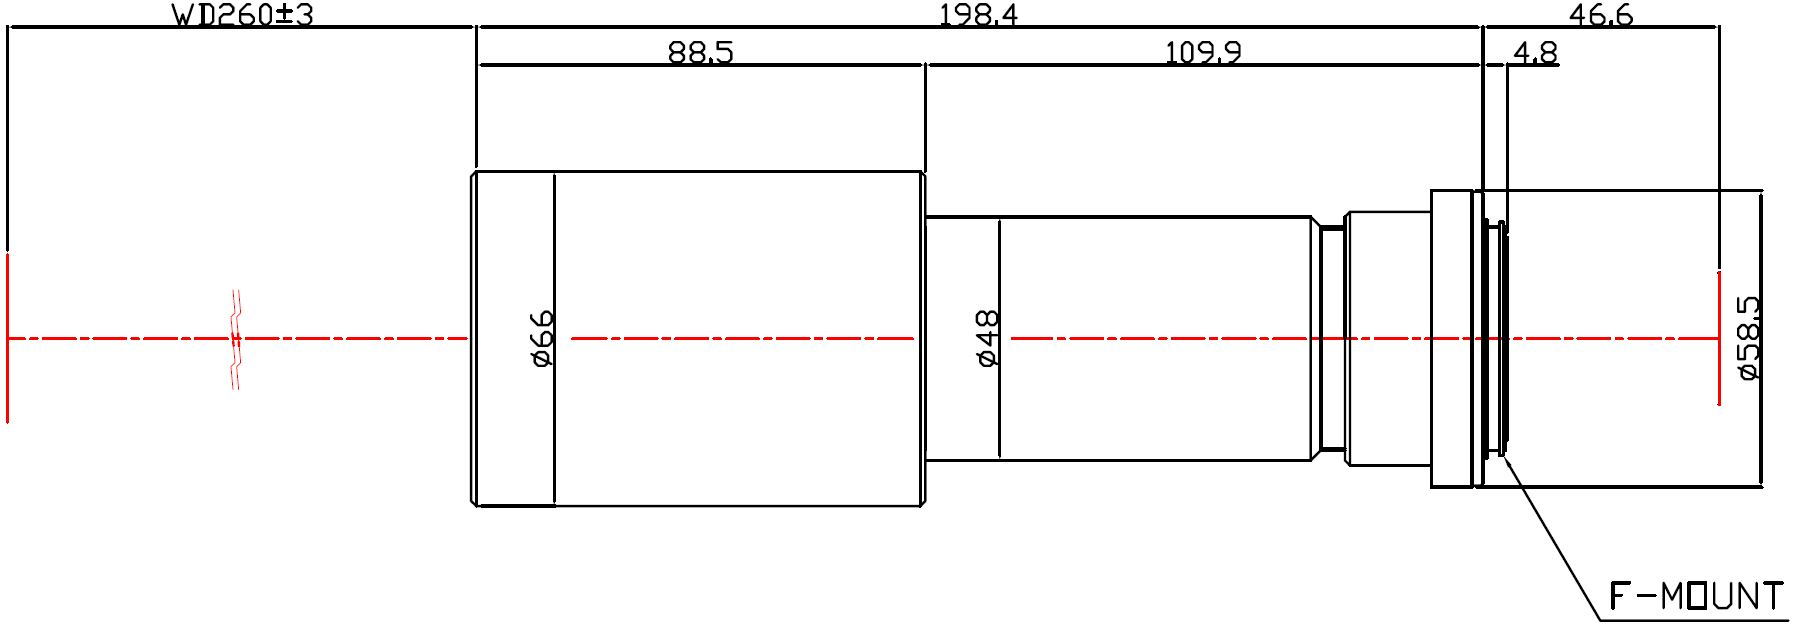 Lensagon MF15M-0789-260